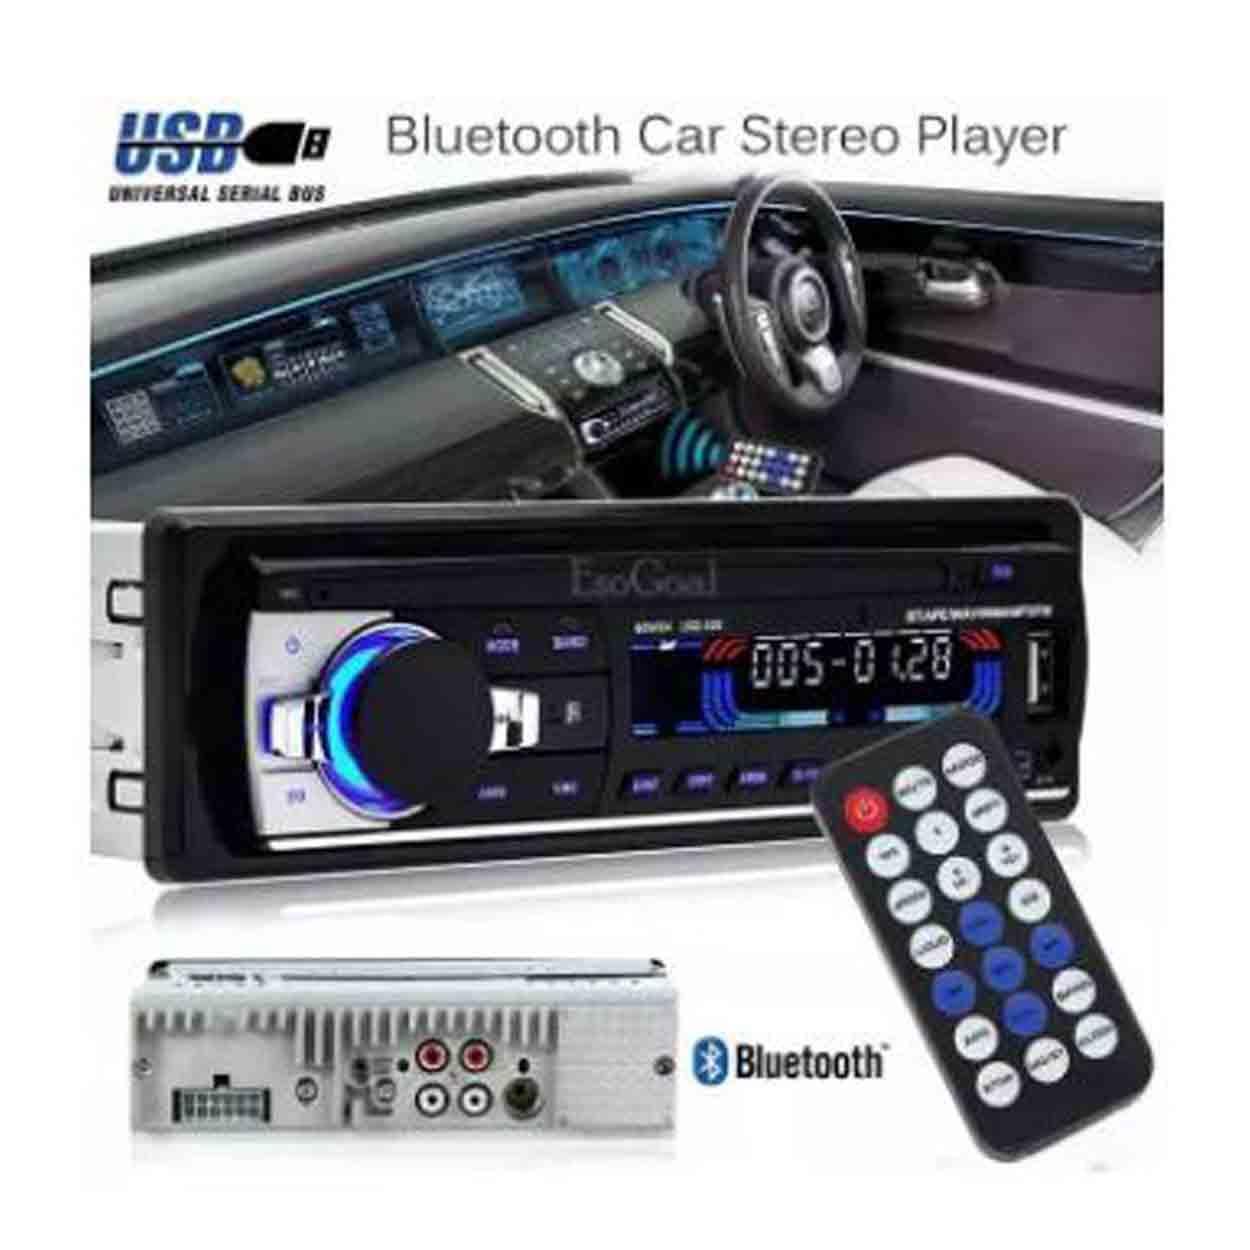 Car Stereo Bluetooth Wireless Digital Media Single-Din in Dash Receivers USB /SD/